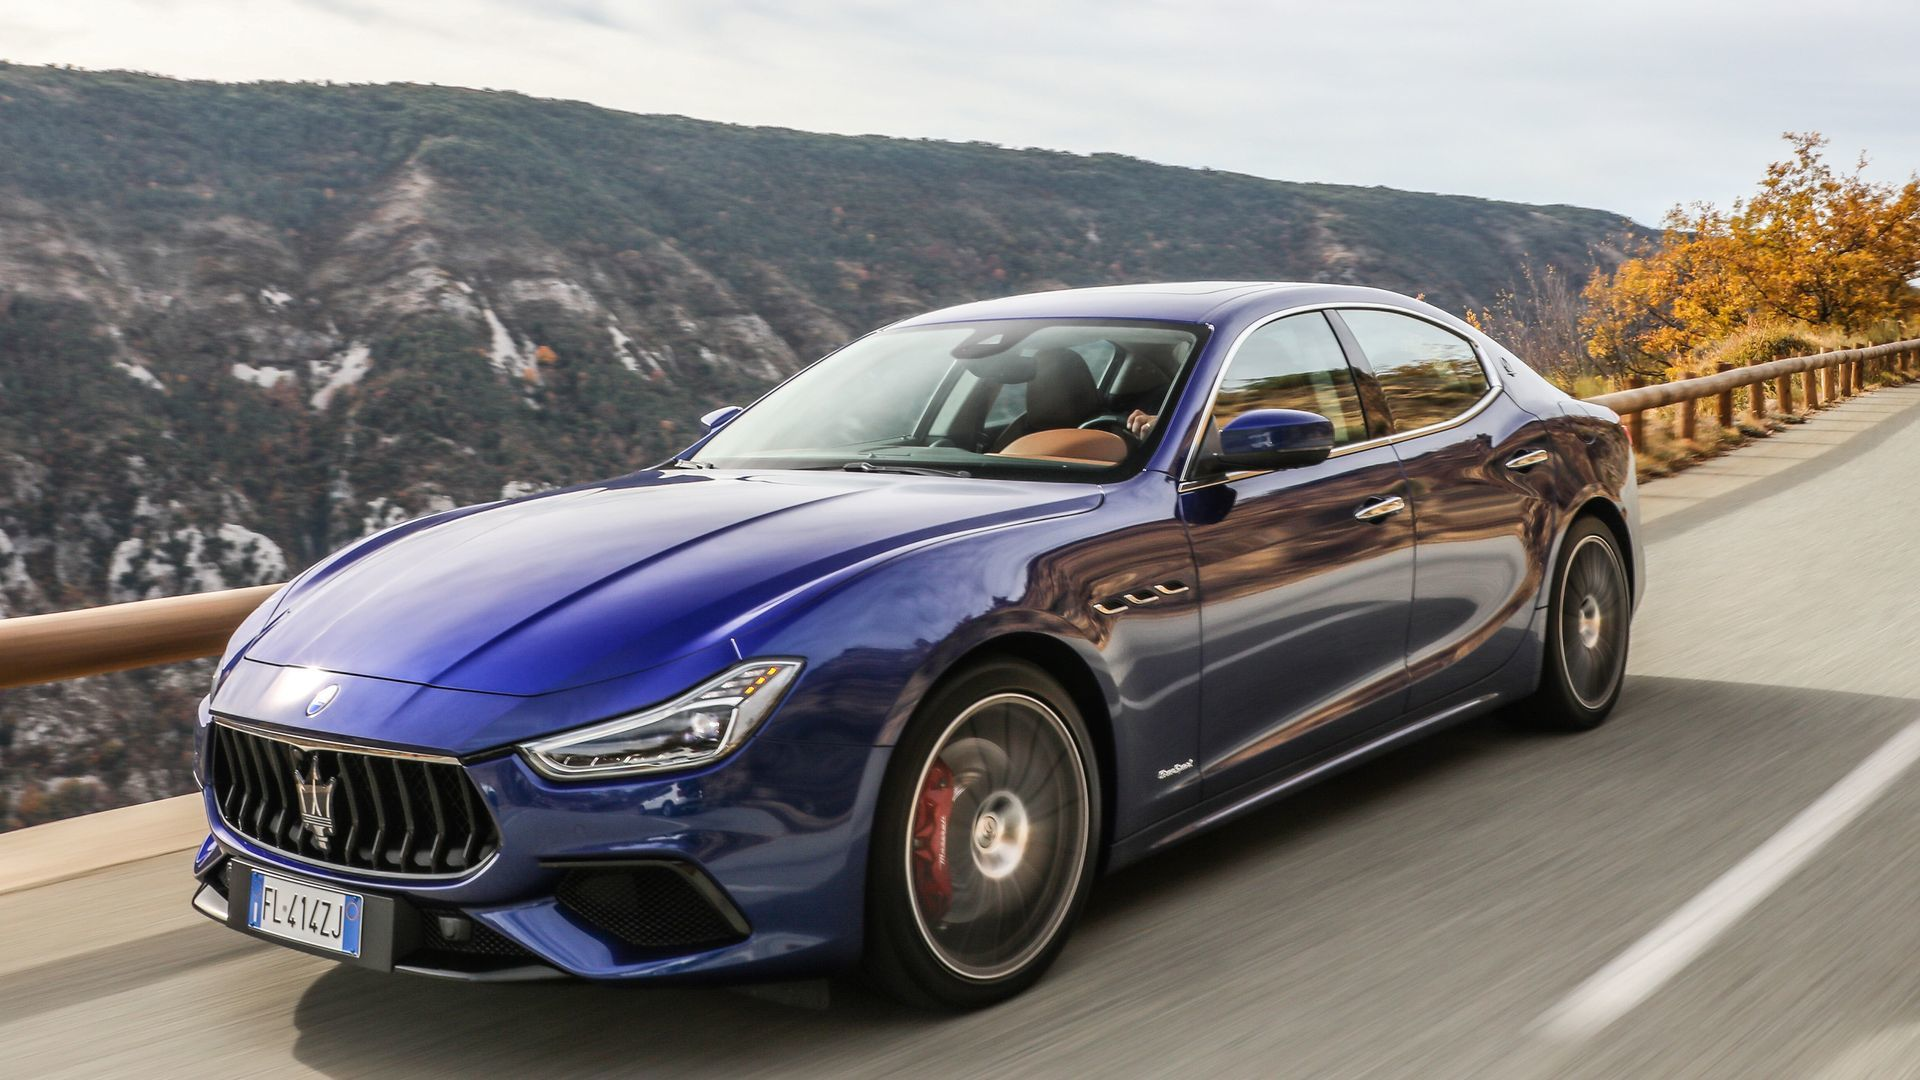 Top10 JJLopez Maserati Ghibli